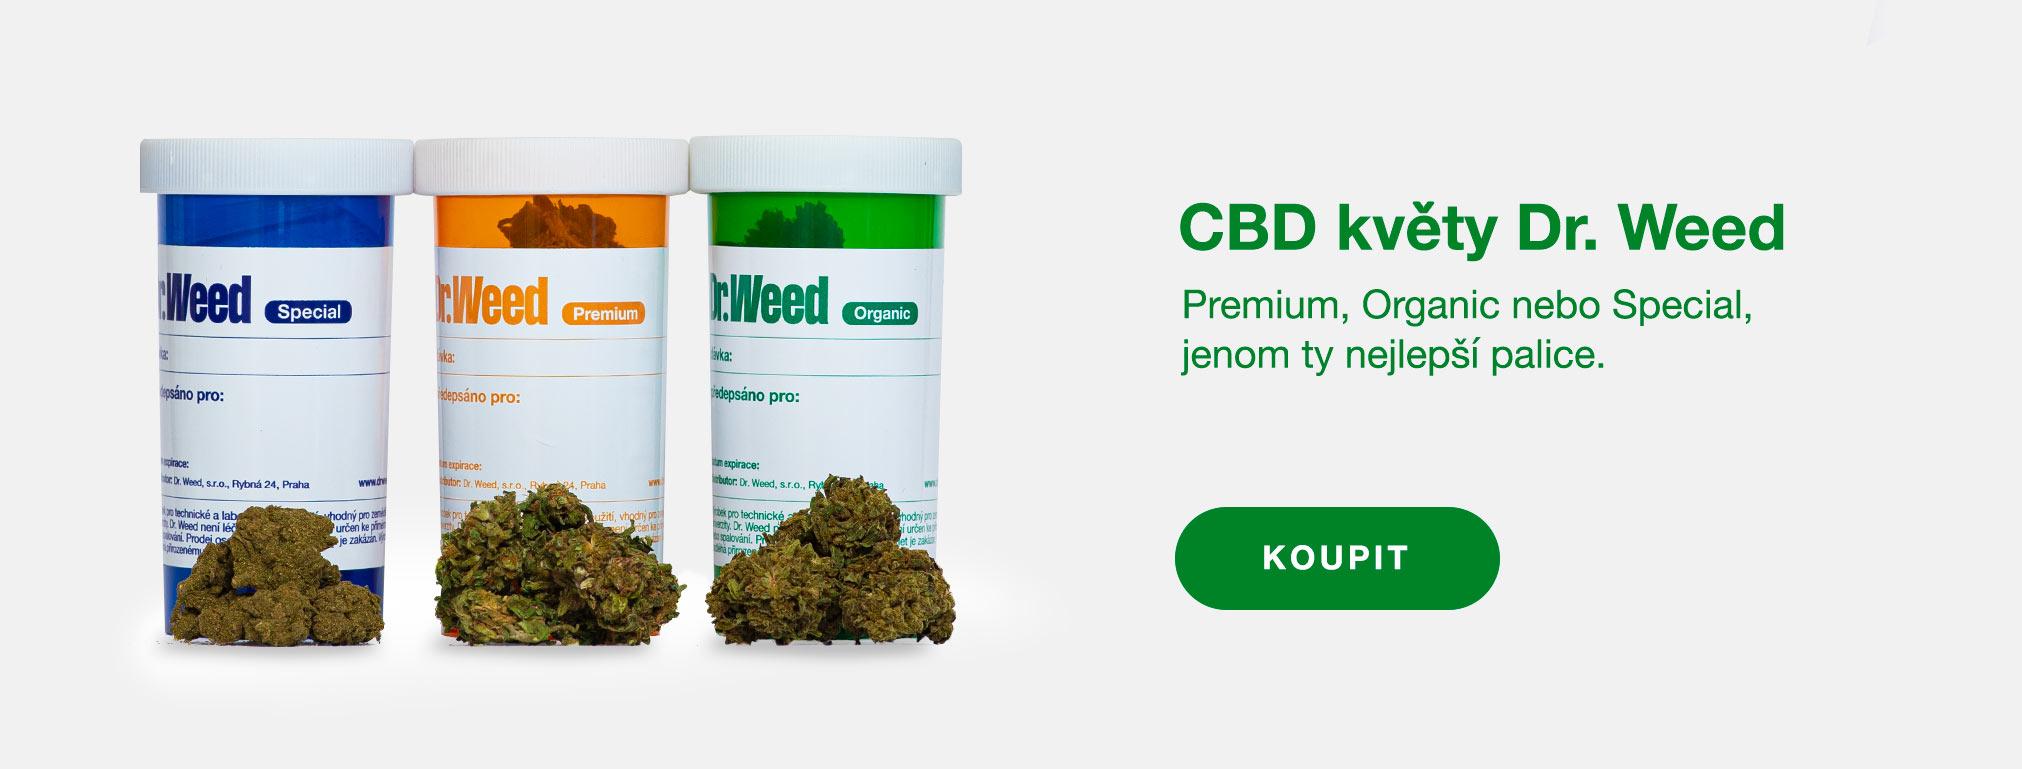 Dr. Weed kvety